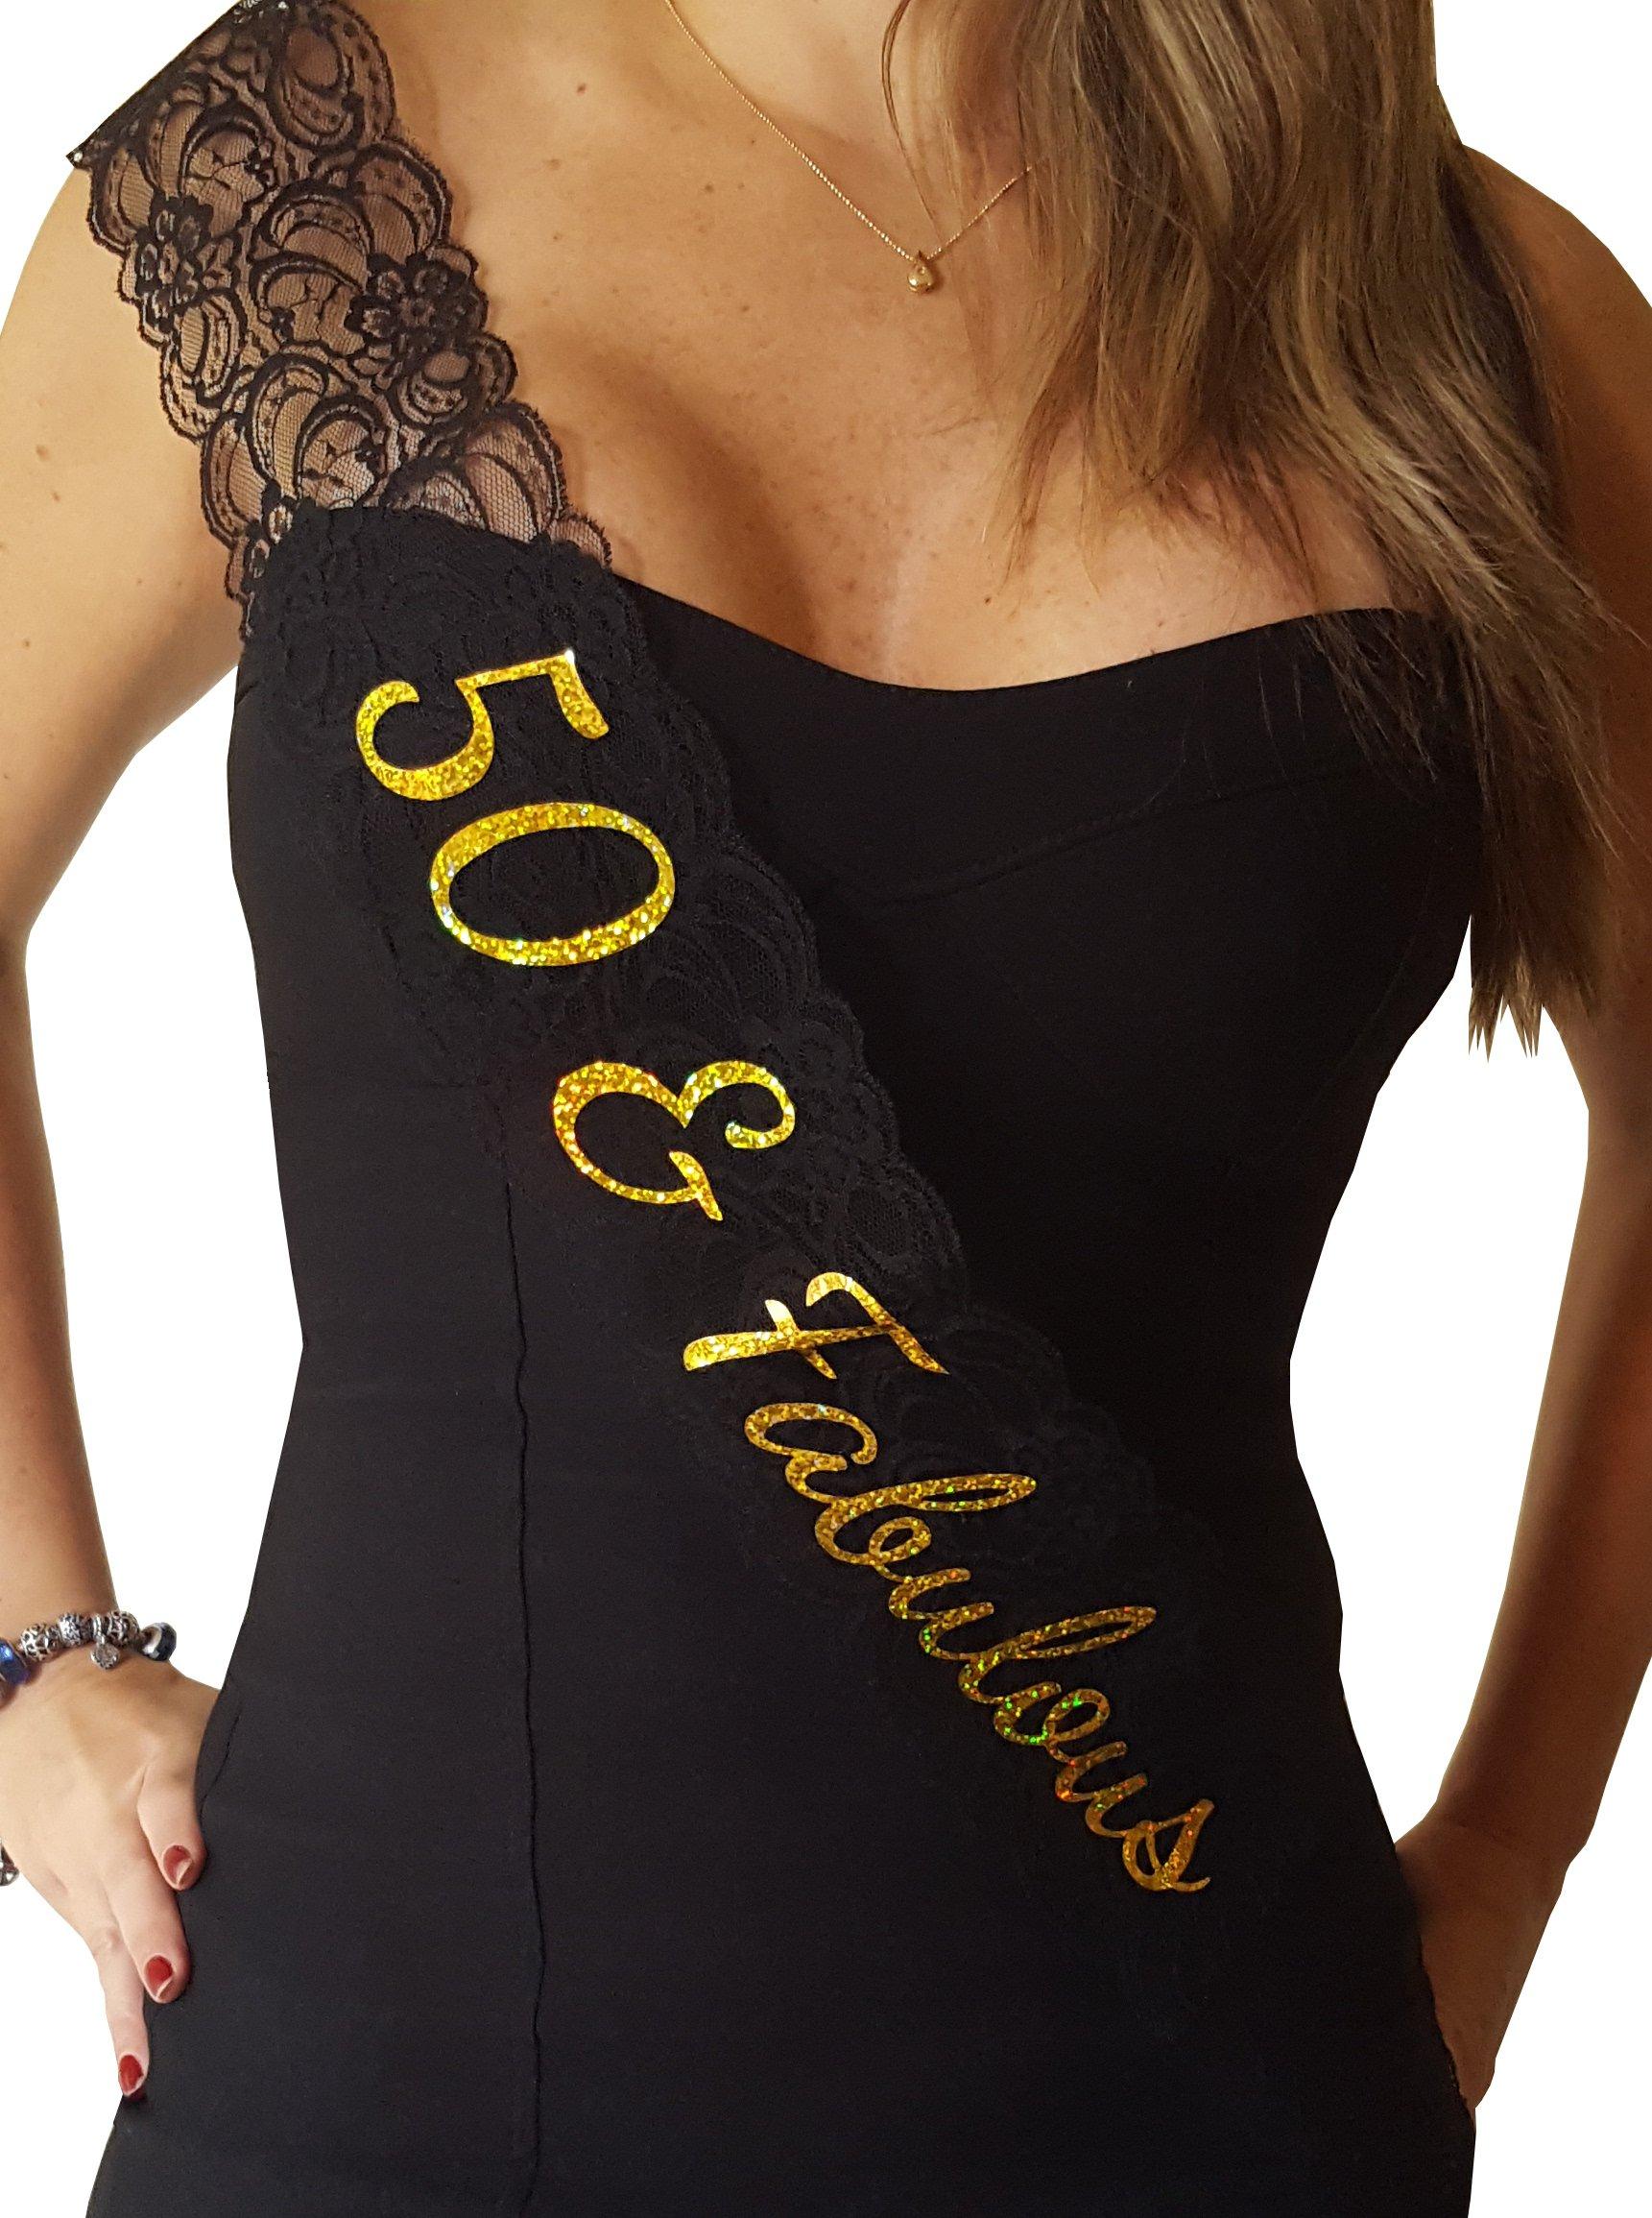 50 & Fabulous Lace Sash - 50th Birthday Sash (Black)